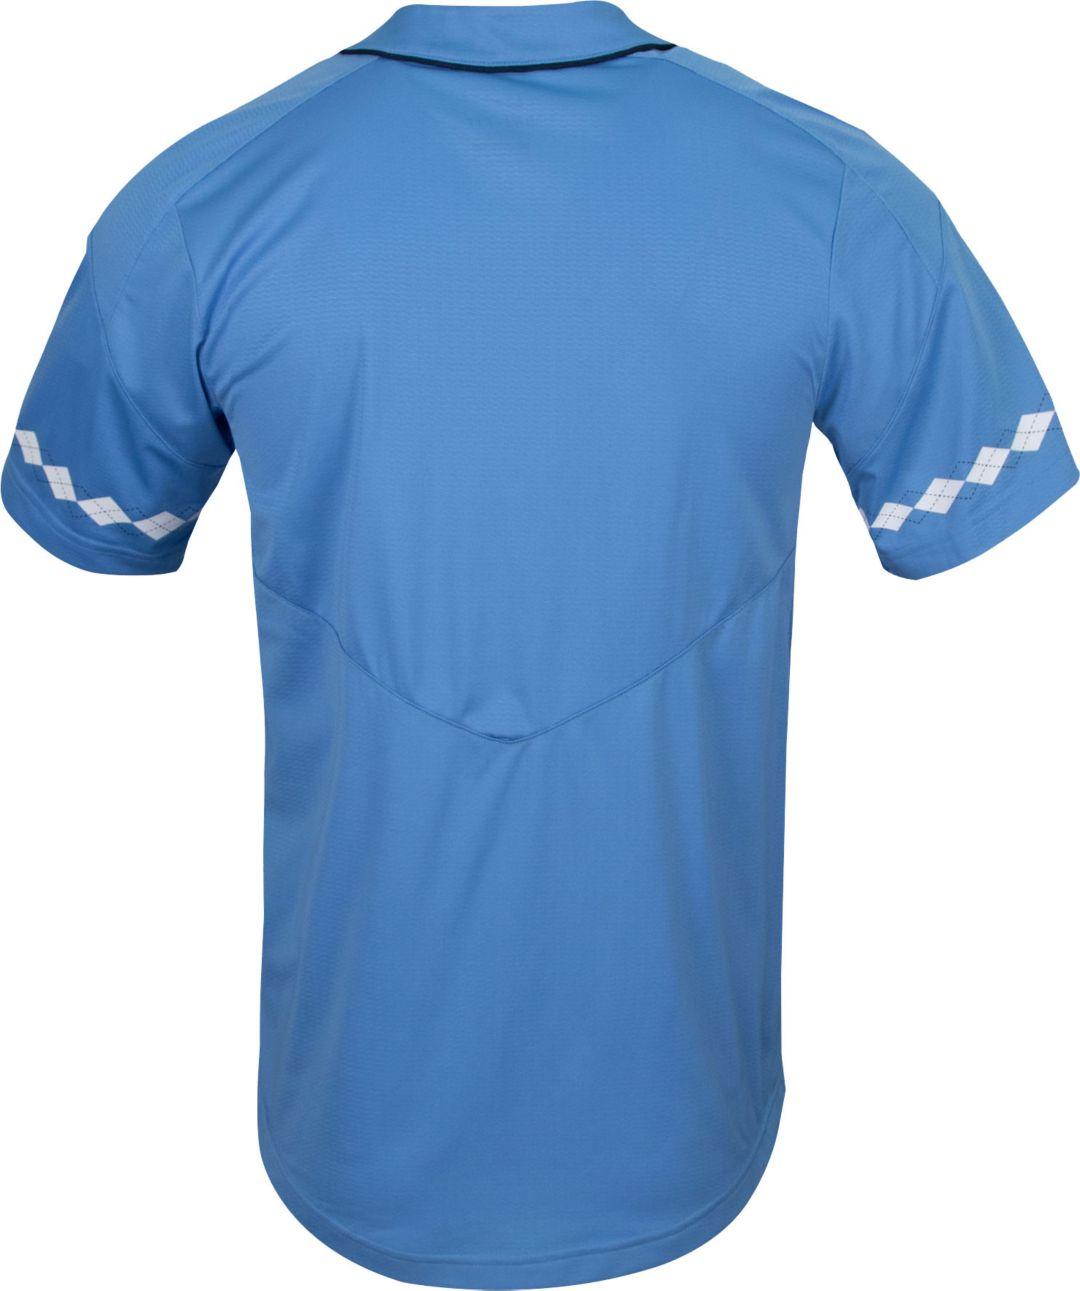 timeless design 873b0 31e34 Nike Men s North Carolina Tar Heels Carolina Blue Dri-FIT Replica Baseball  Jersey. noImageFound. Previous. 1. 2